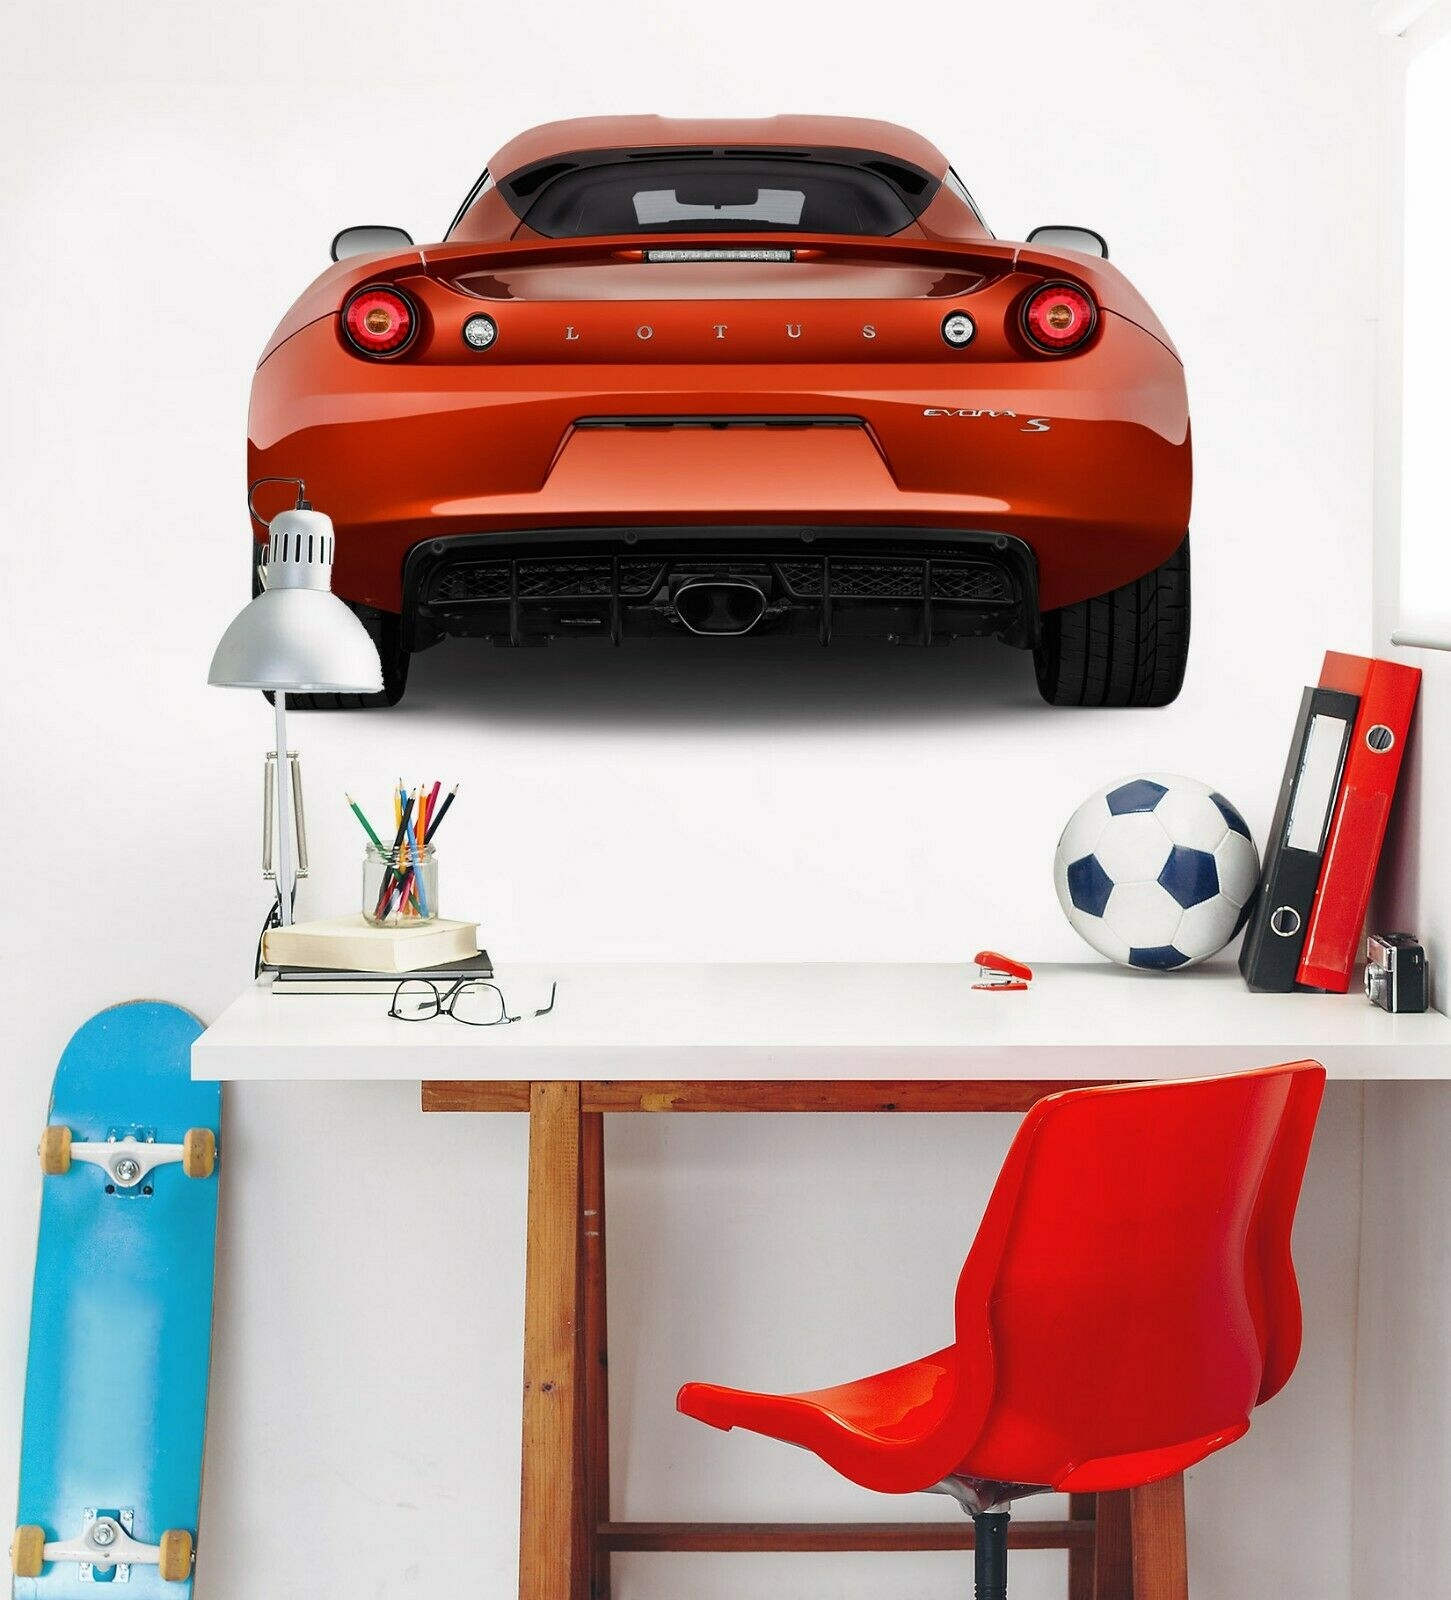 3D Lotus Evora C230 Auto Wallpaper Wandbild Poster Transport Wandaufkleber Wend